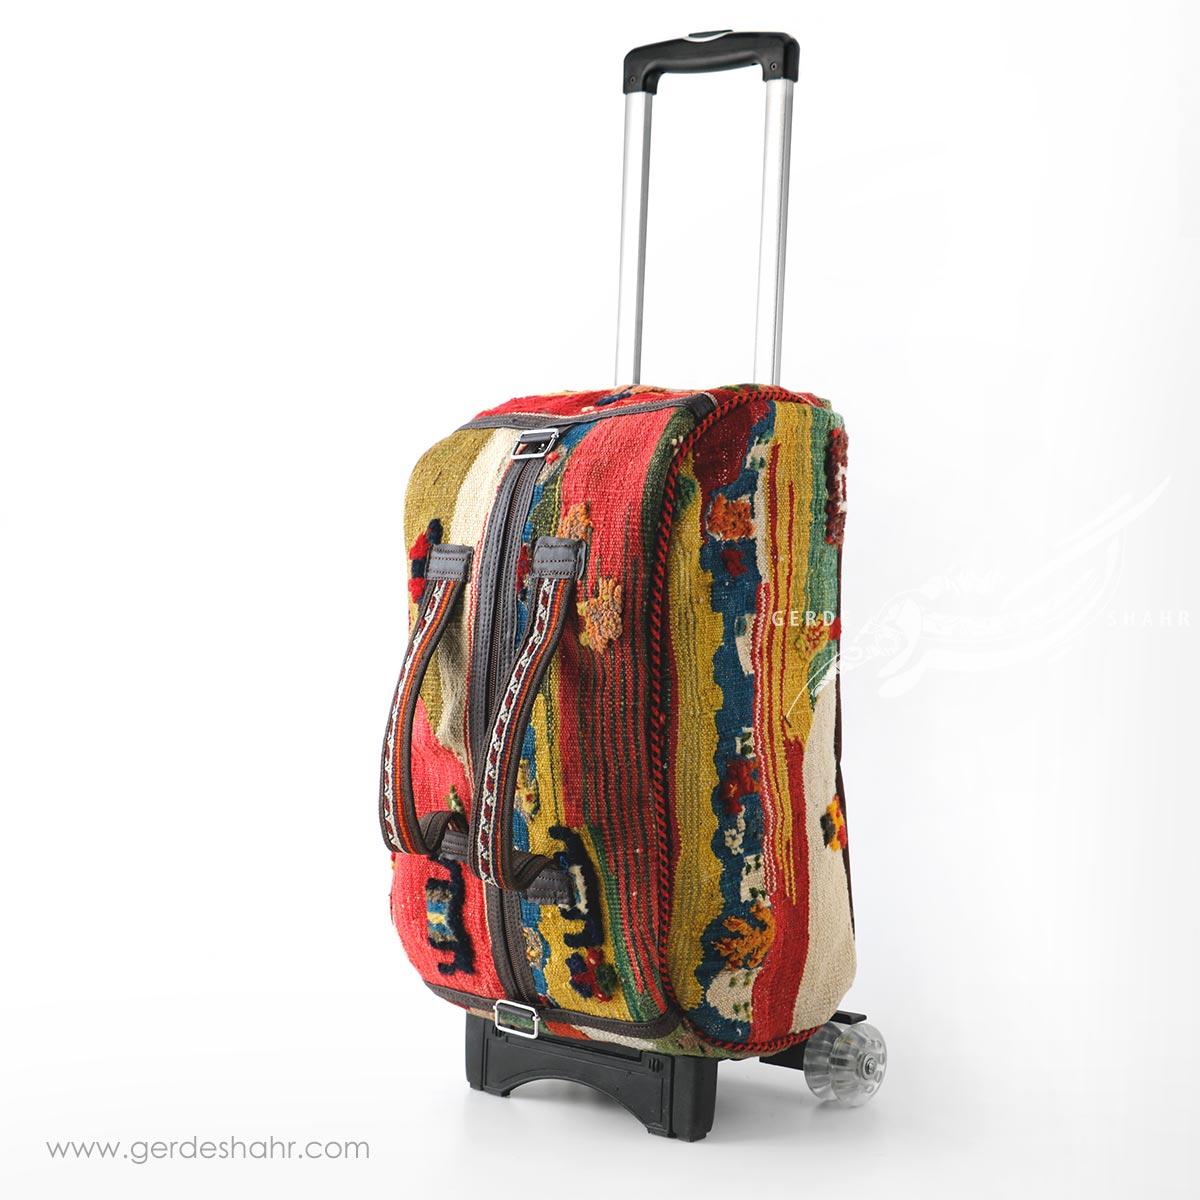 چمدان گلیم گبه طرح 4 سان ست گنجه رخت